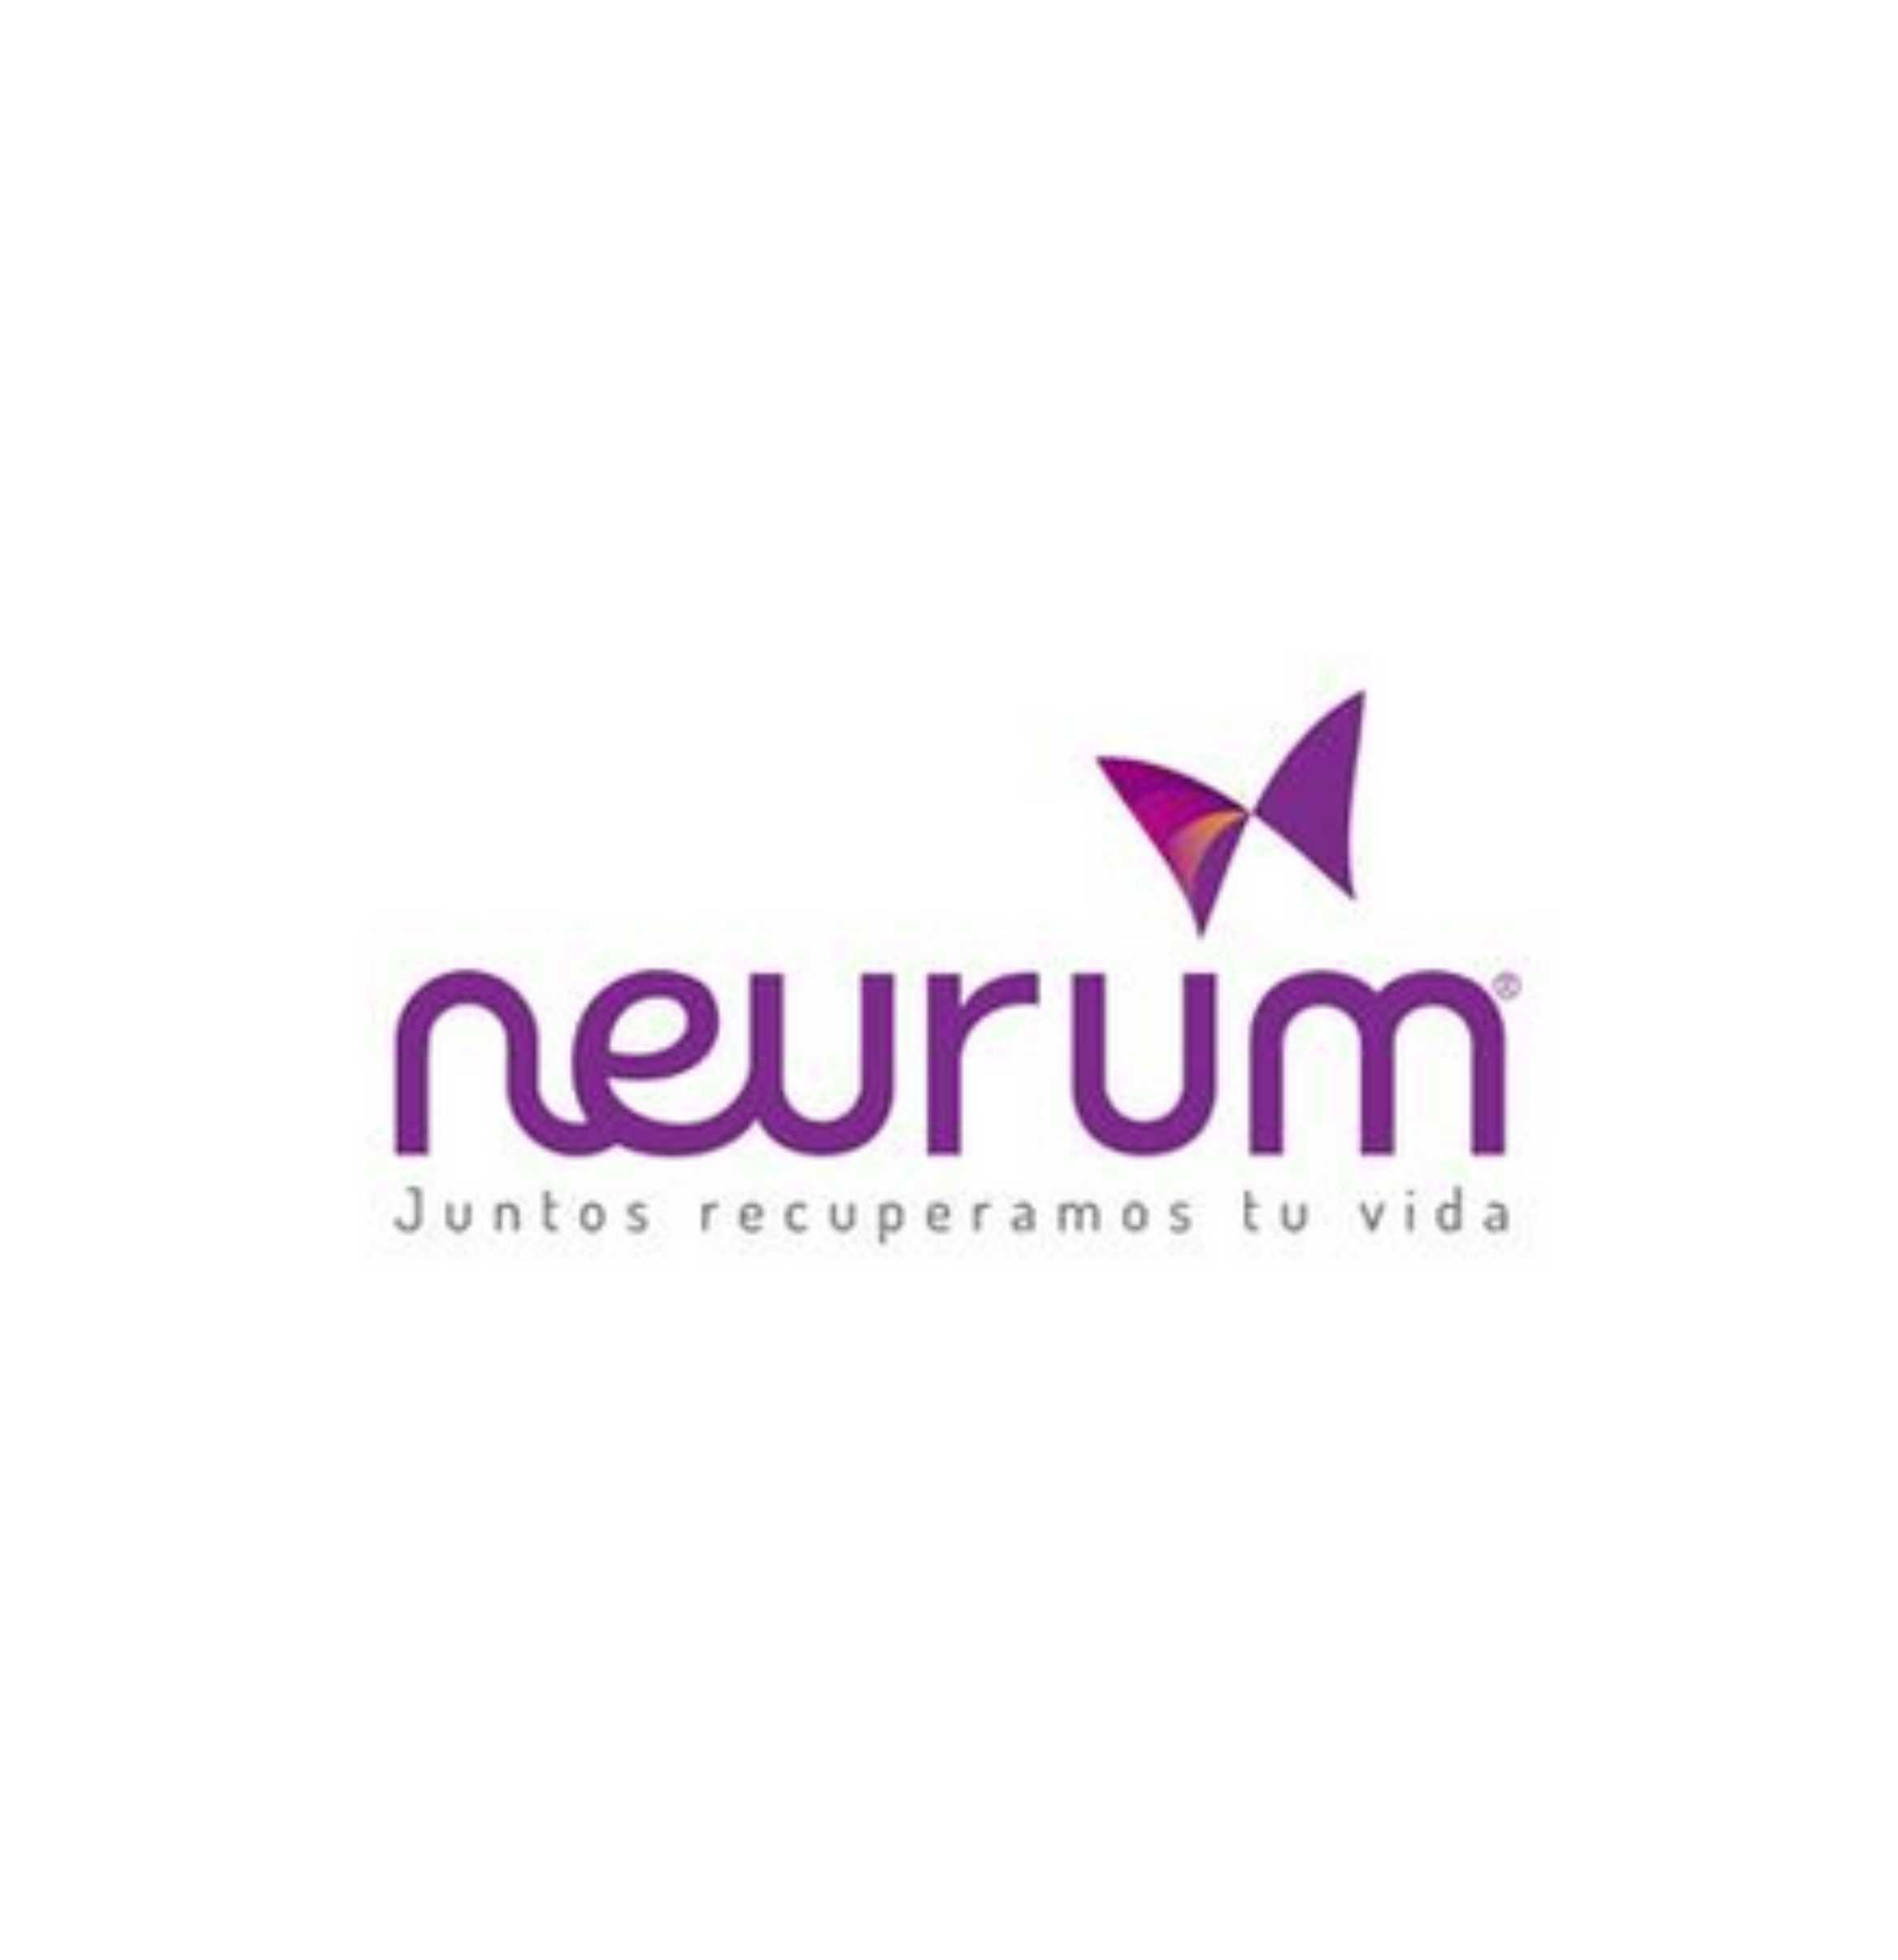 Neurum